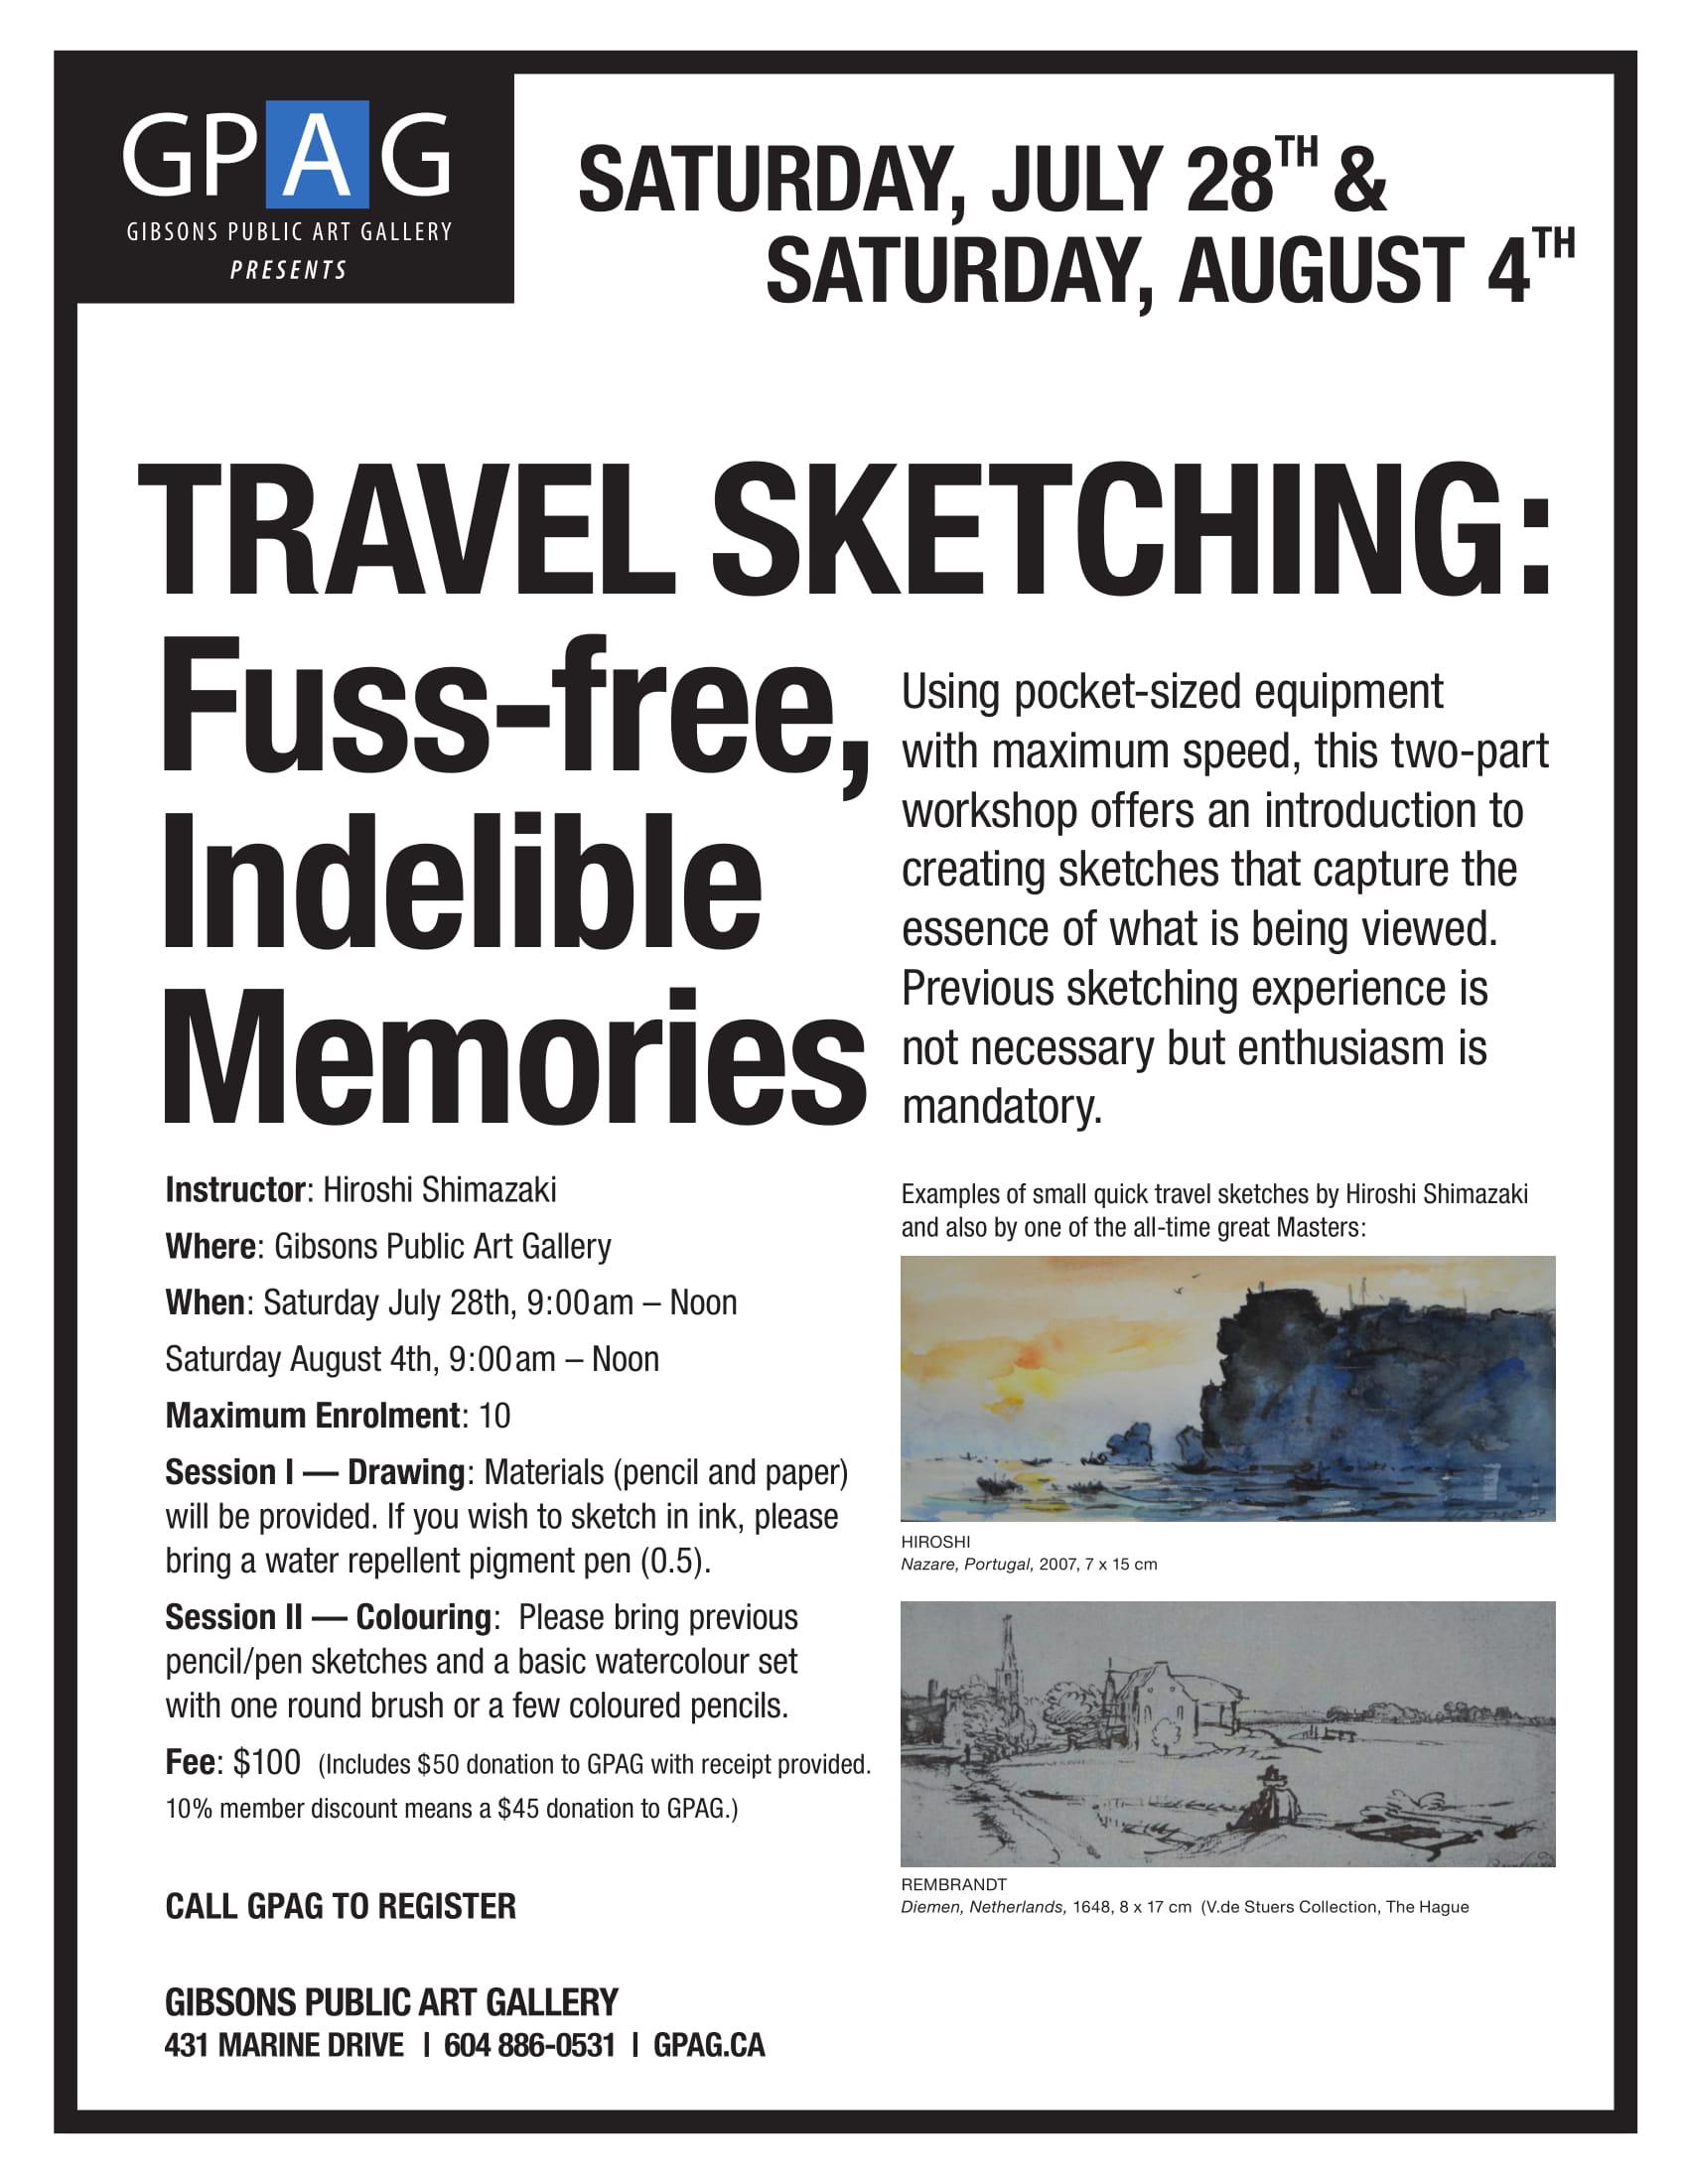 Travel Sketching Workshop